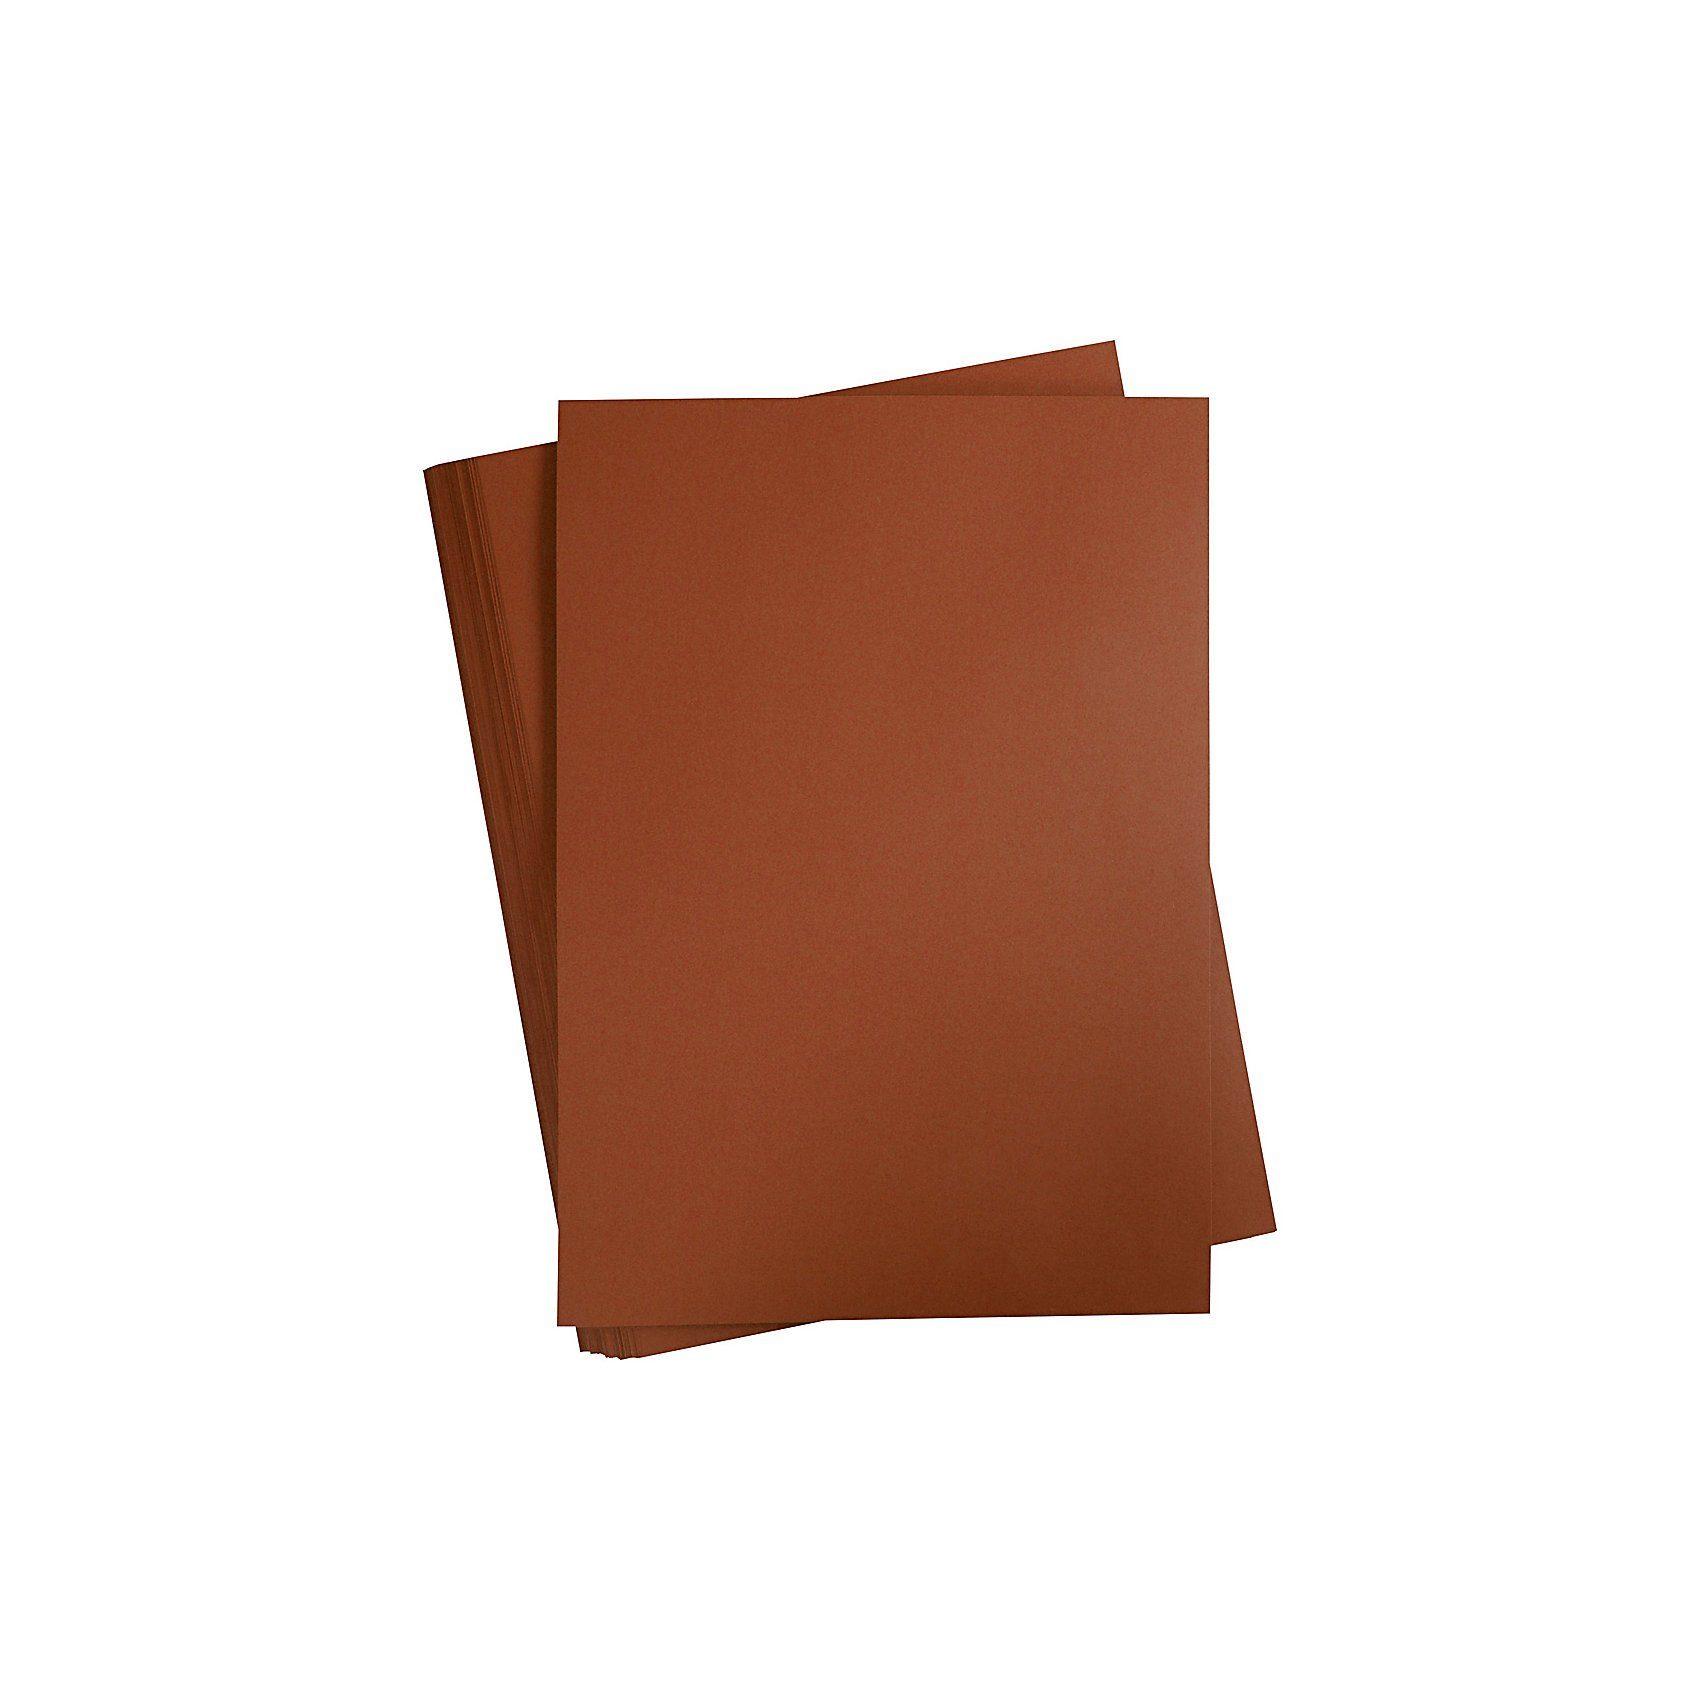 Karton, farbig, A2 420x600 mm, 180 g, Kaffeebraun, 100 Blat